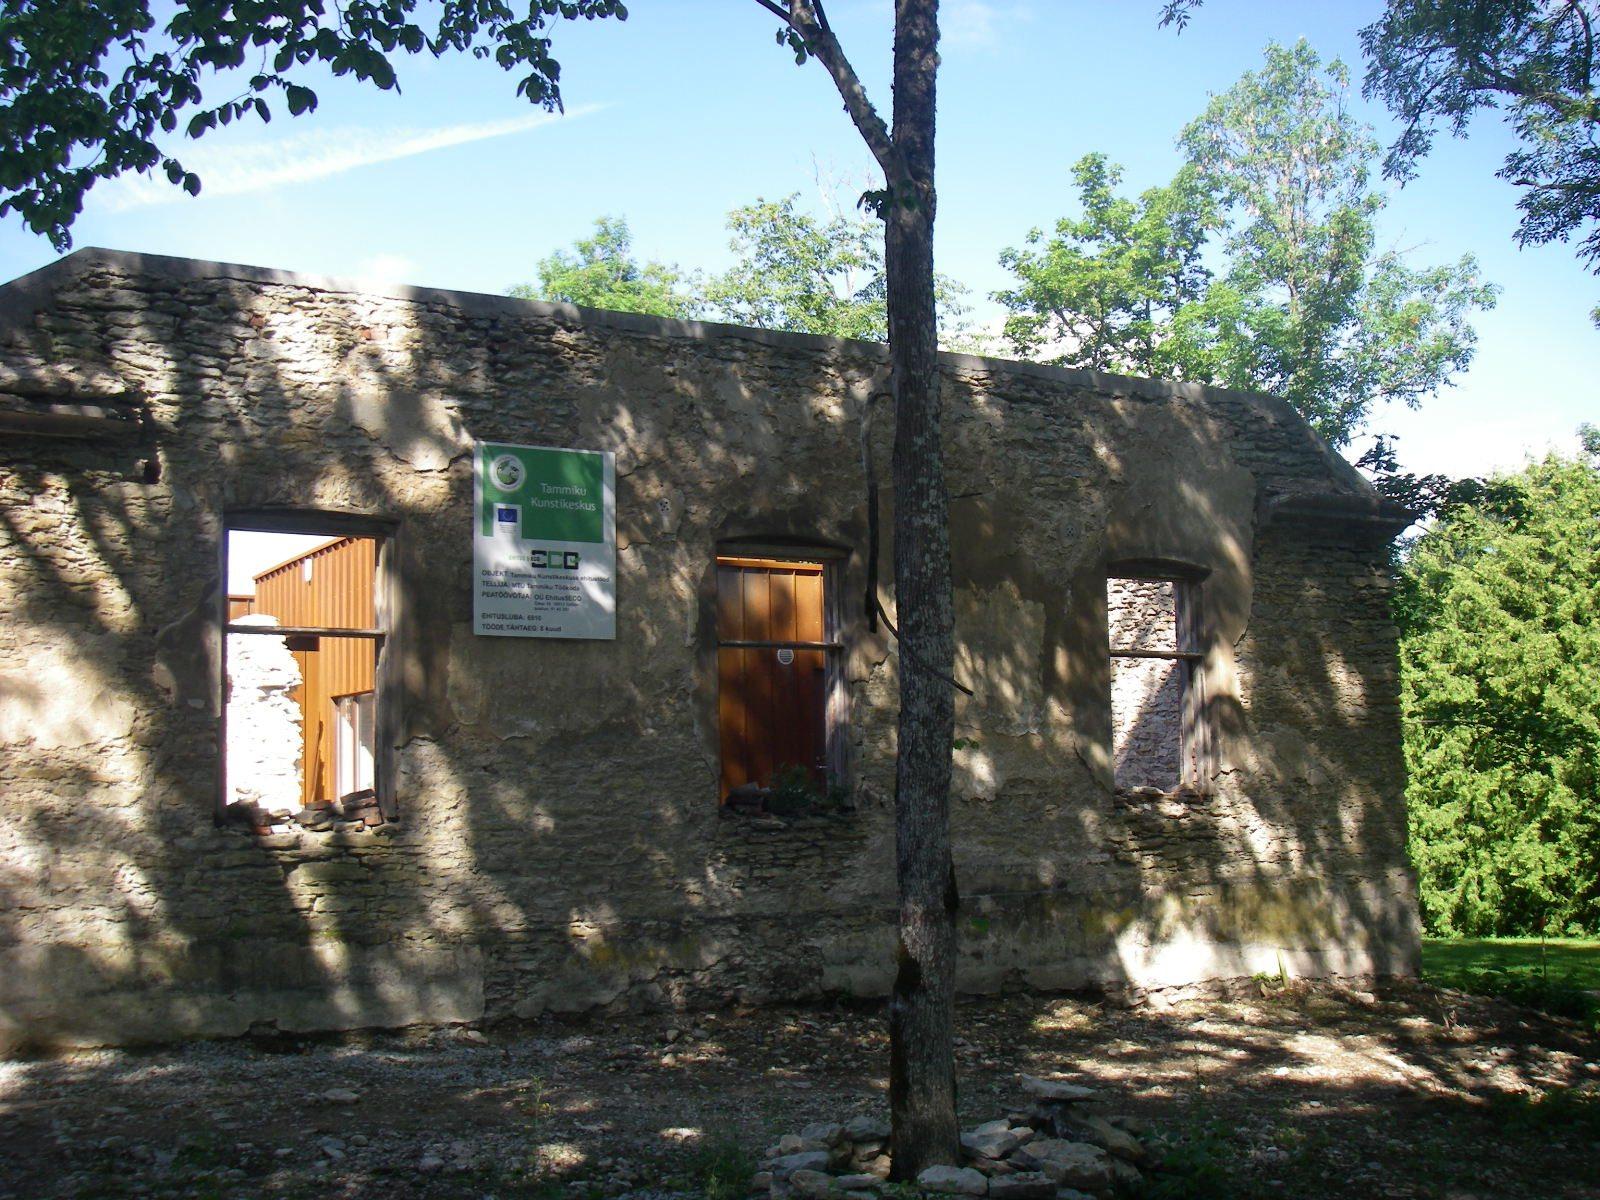 Construction of Tammiku Art Centre